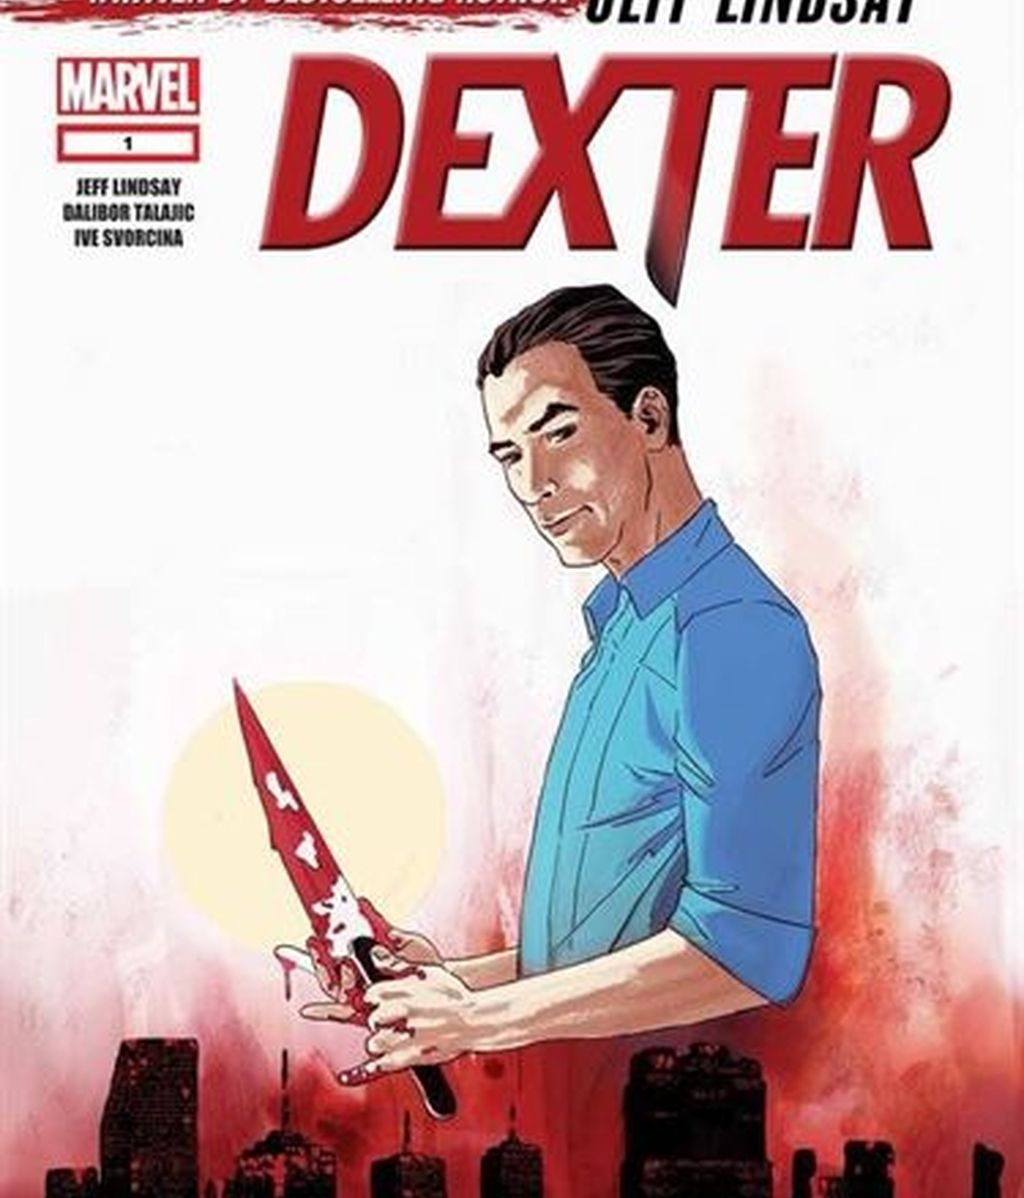 Cómic 'Dexter'